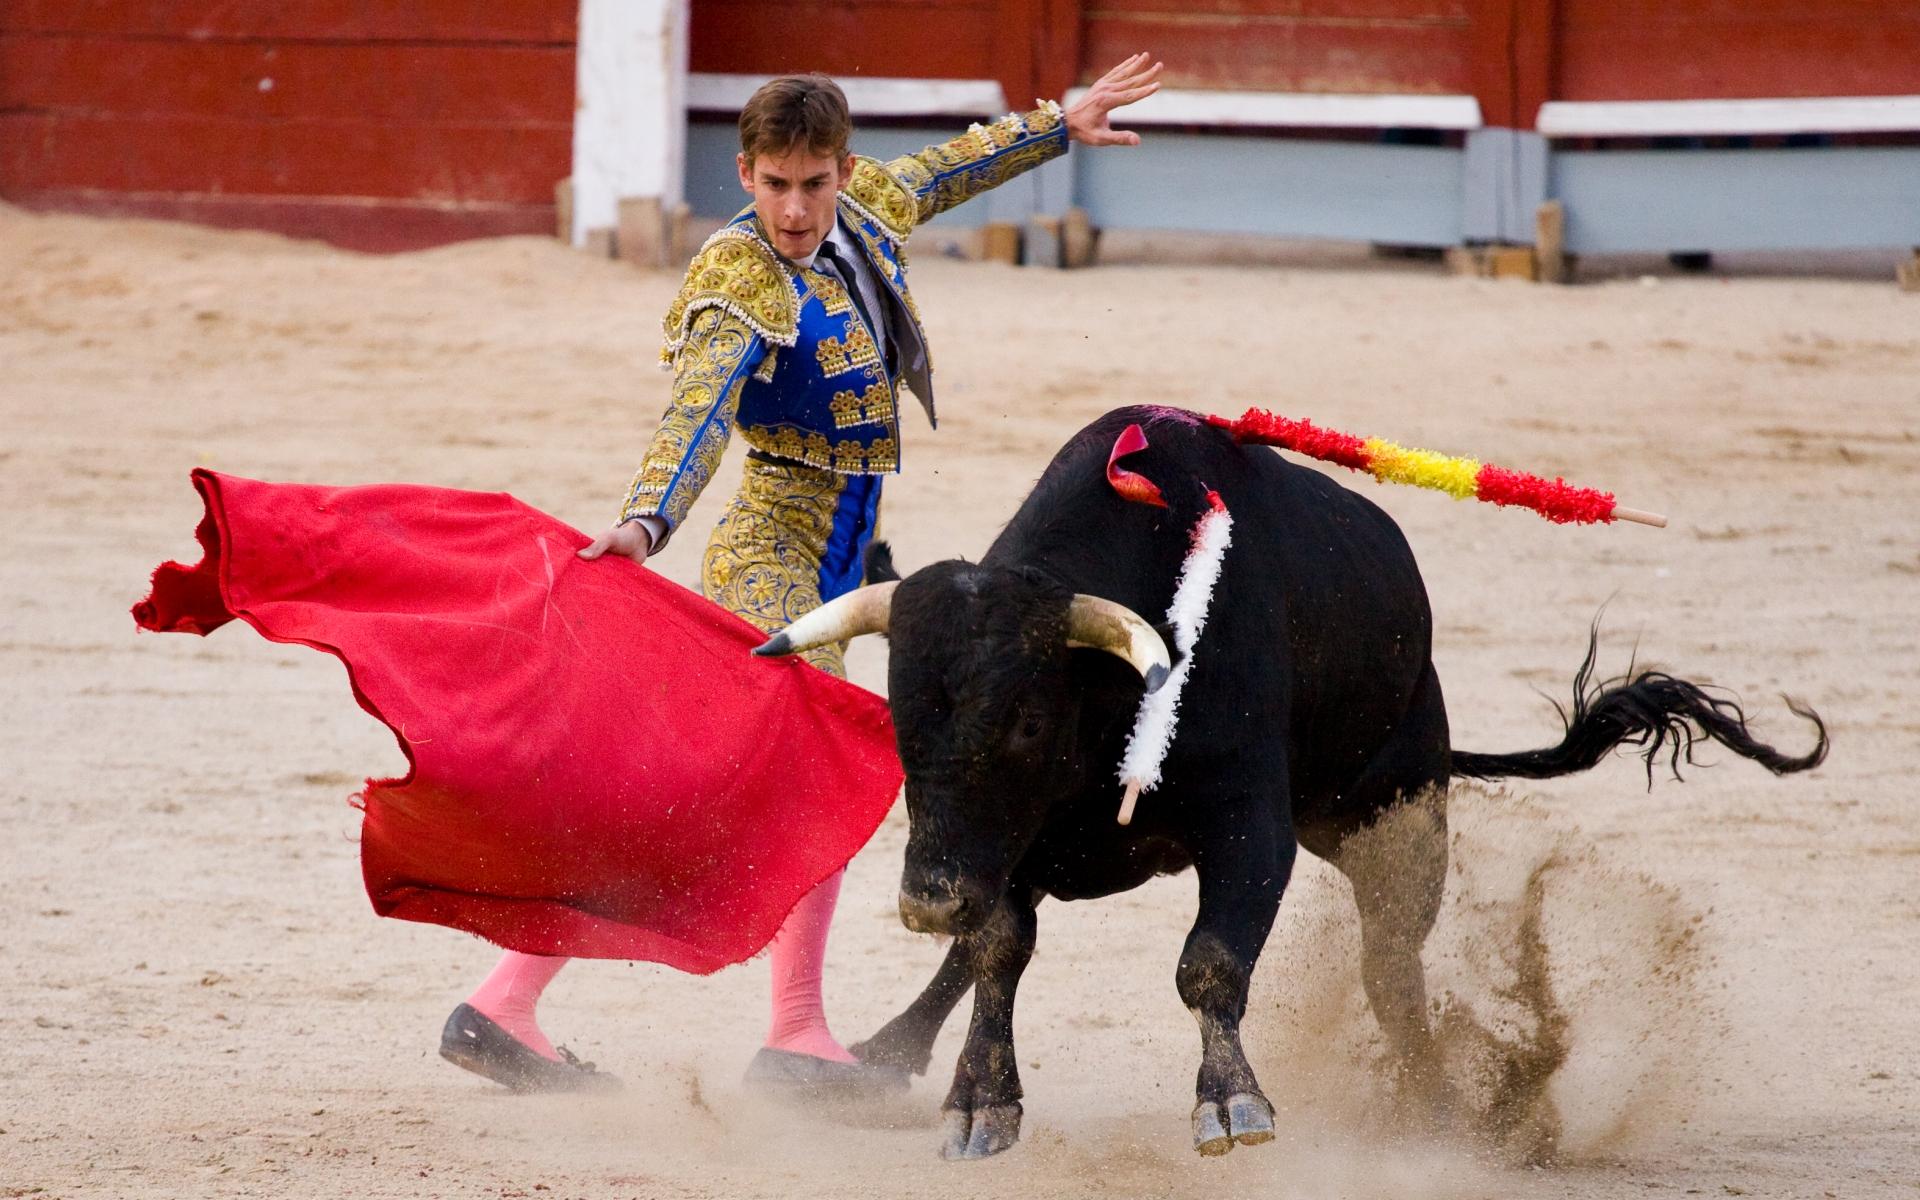 bull fighting 1920x1080 hd - photo #19